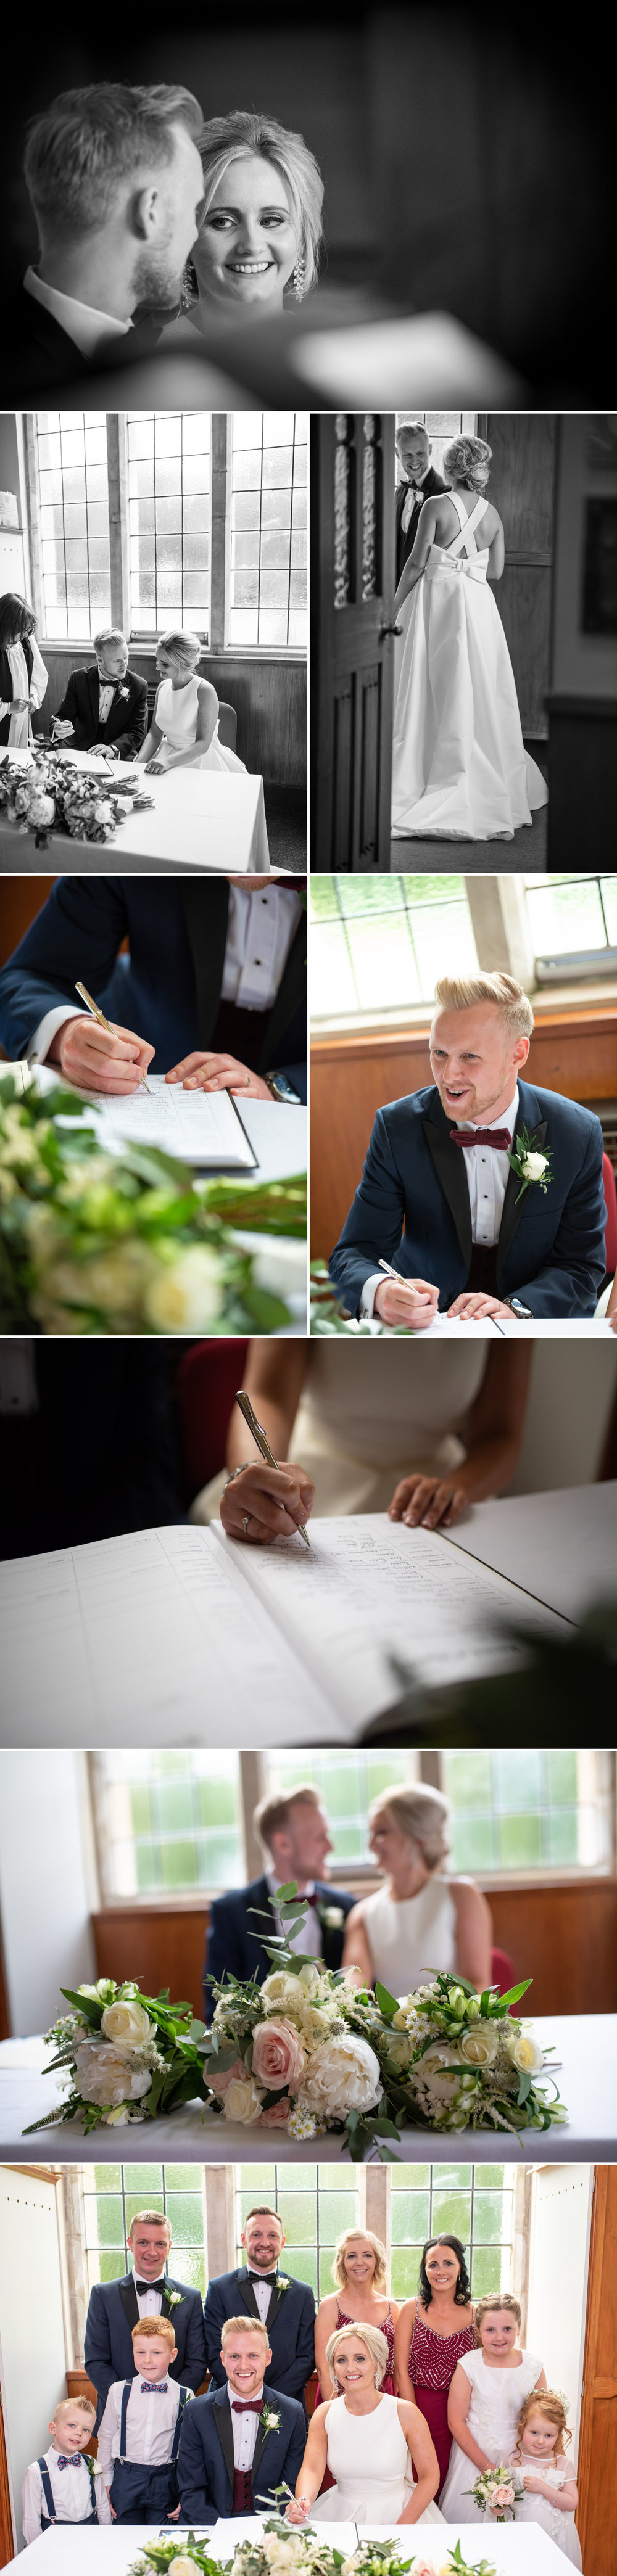 best wedding photographers northern ireland 09.jpg